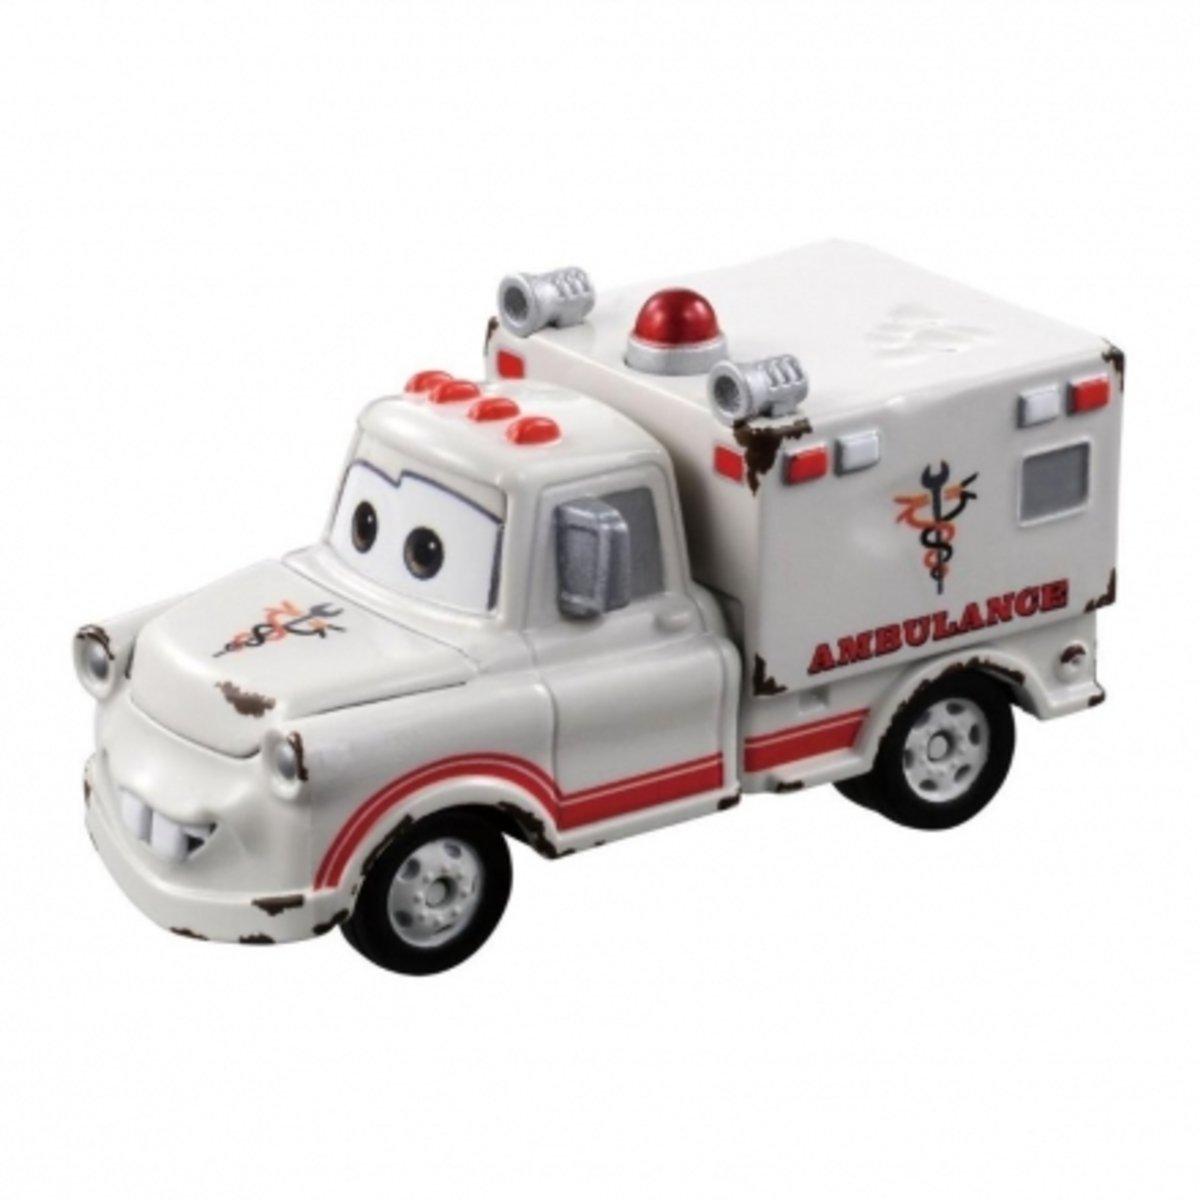 Disney Pixar Cars C-31 Rescue Go Go Ambulance Type